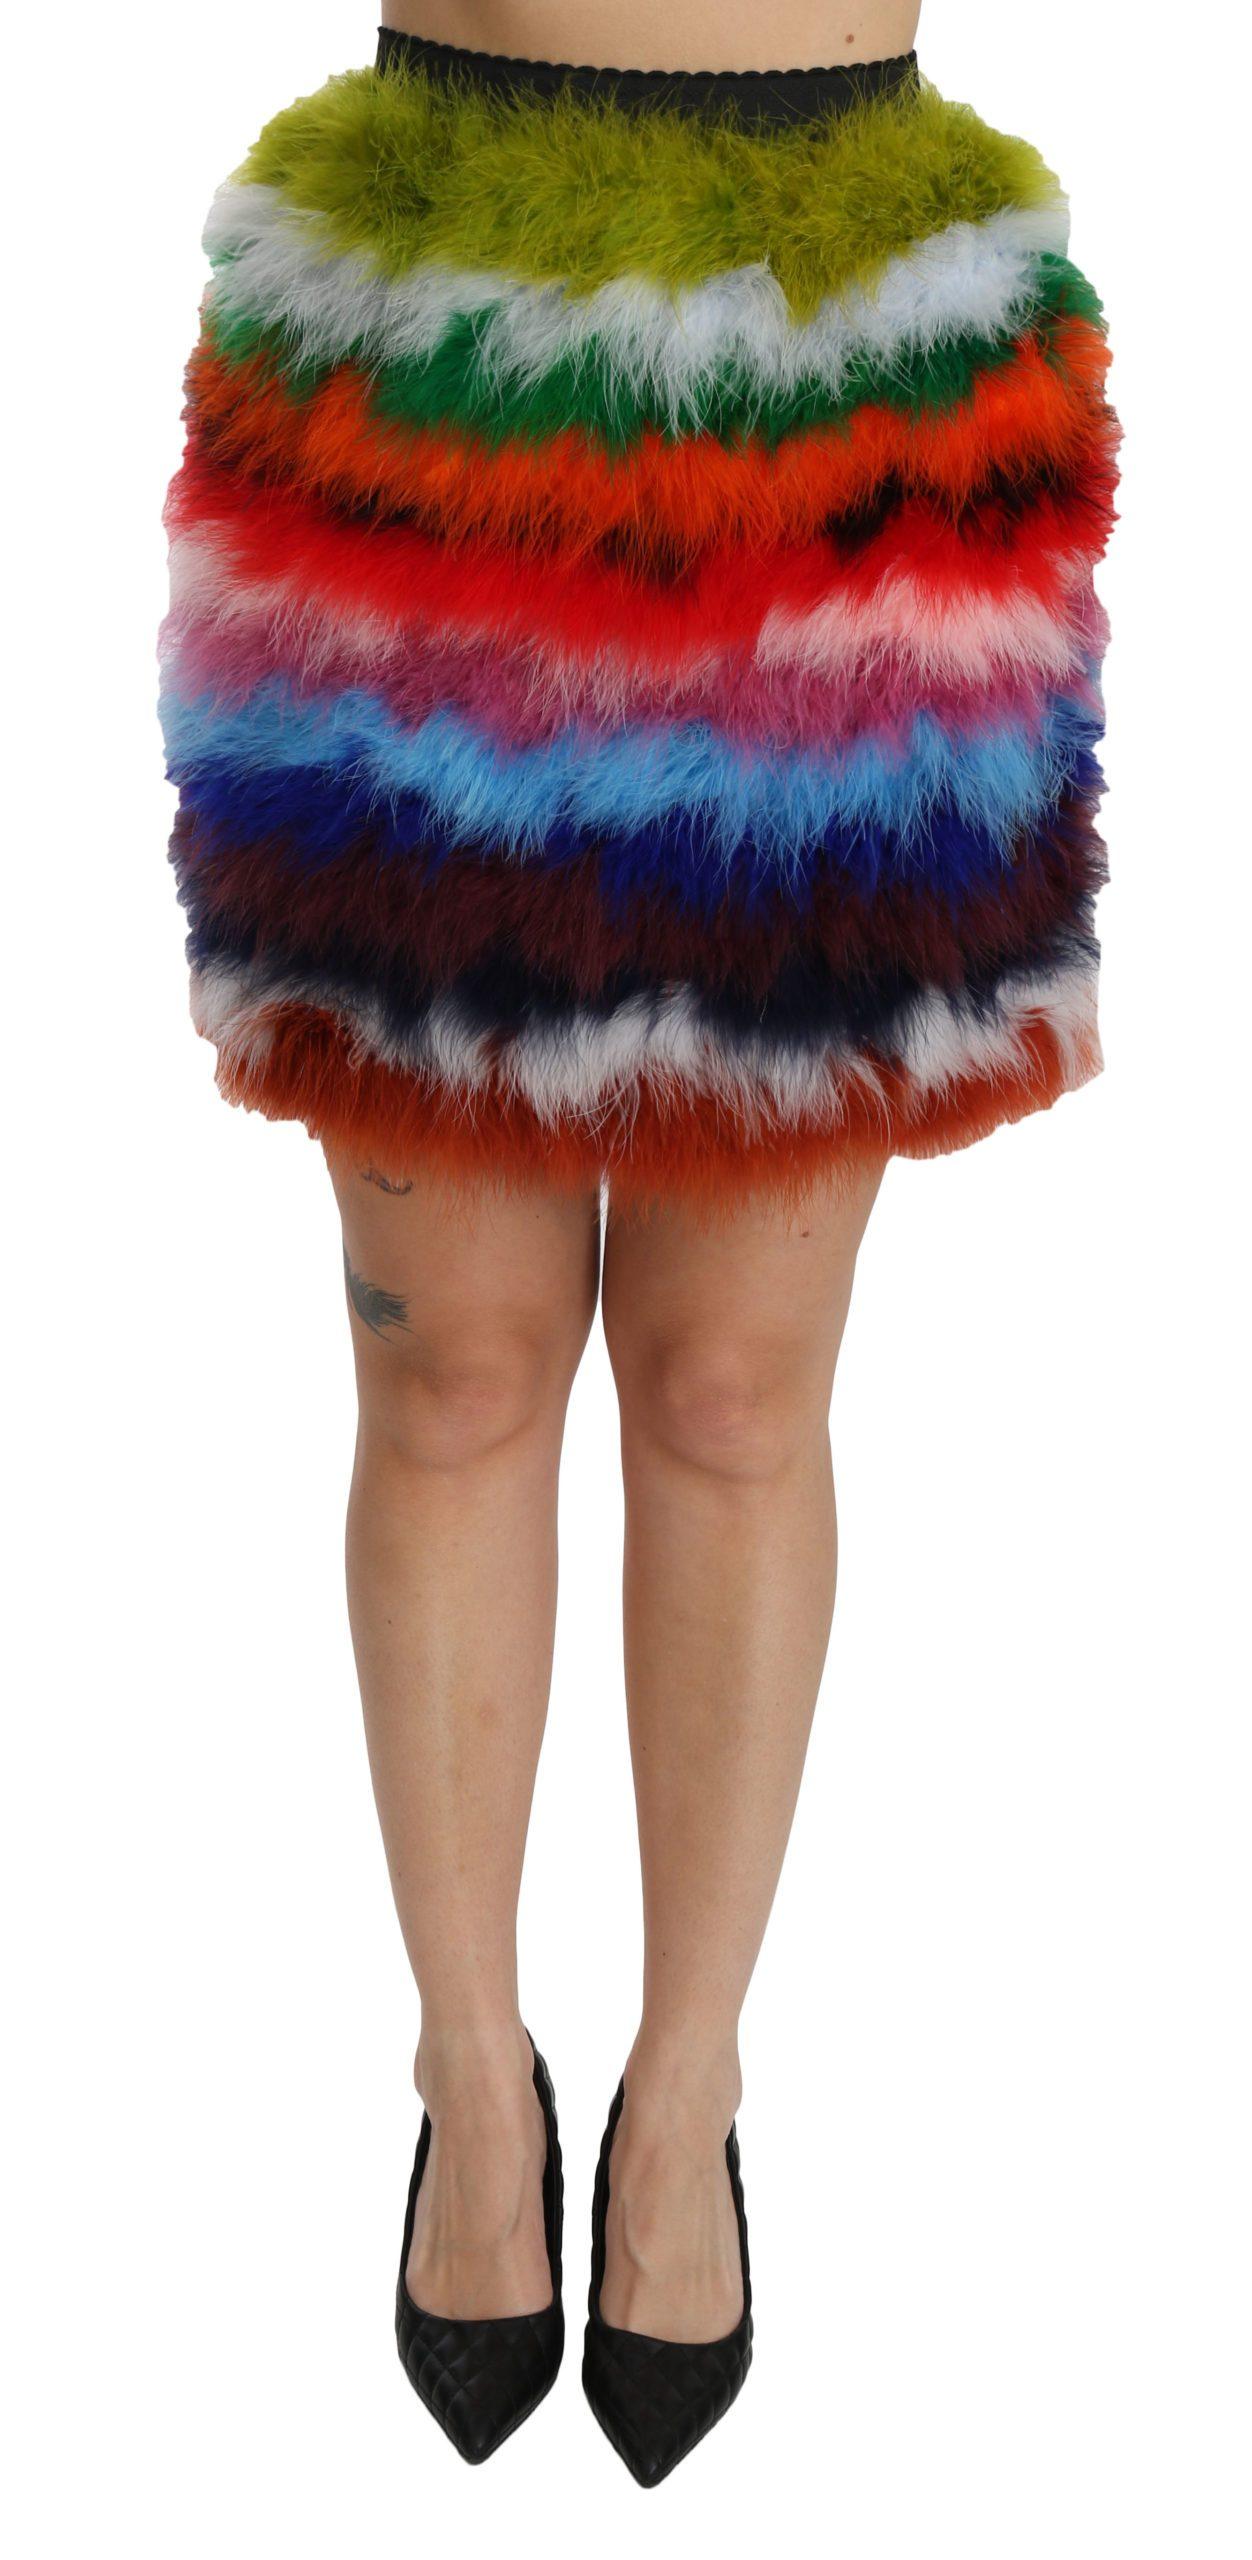 Dolce & Gabbana Women's High Waist Mini Feather Skirt Multicolor SKI1356 - IT36 | XS